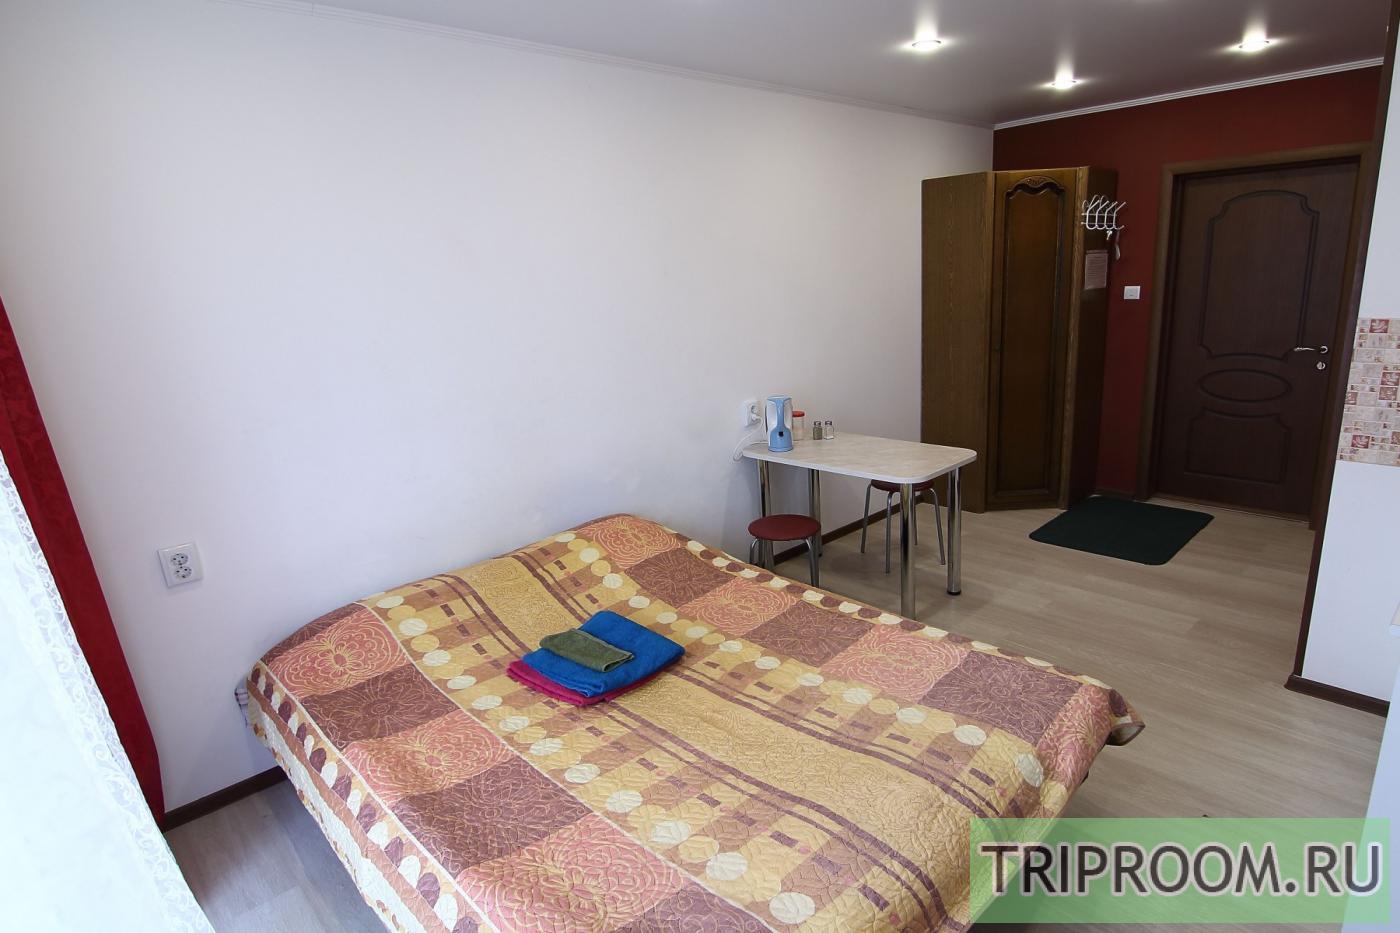 1-комнатная квартира посуточно (вариант № 10582), ул. Романа Брянского улица, фото № 1